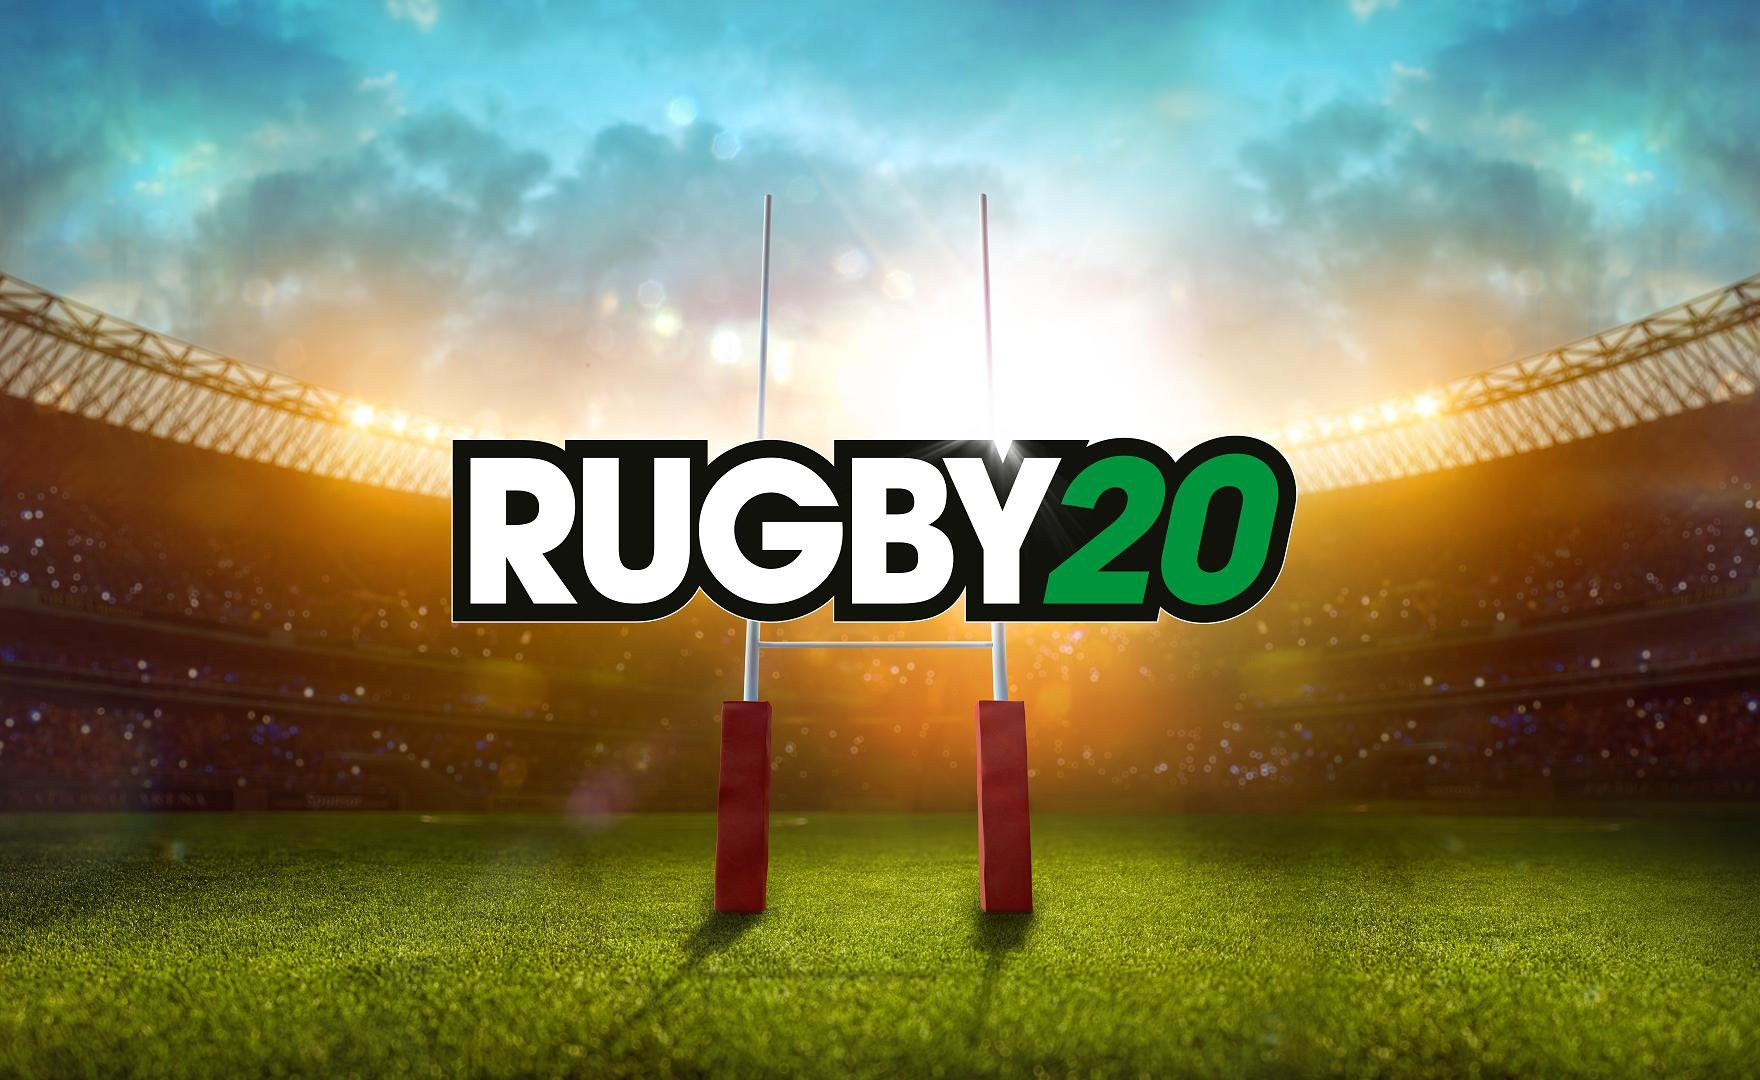 Rugby 20 svela tutte le sue licenze ufficiali